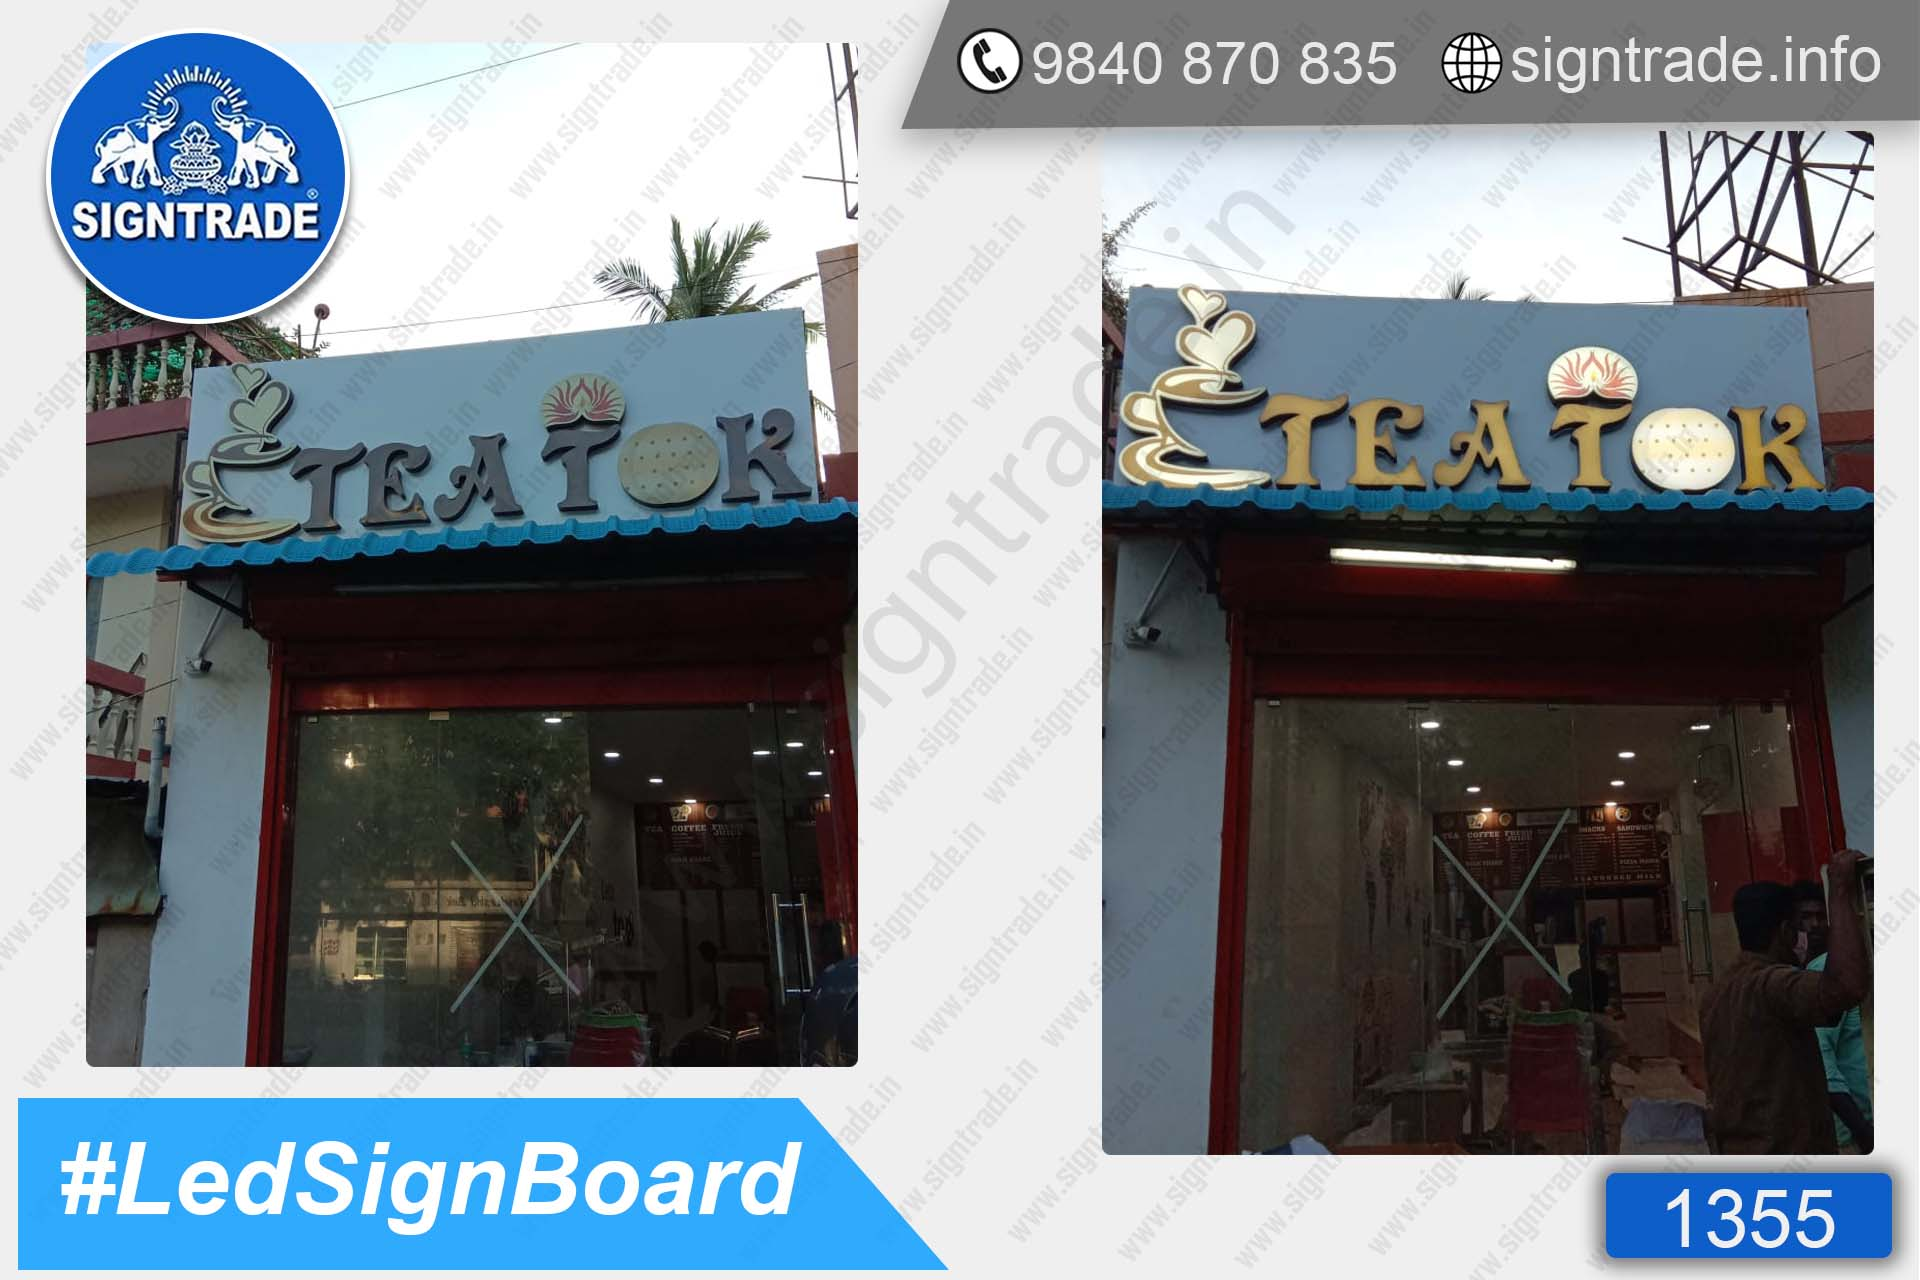 TEA TOK sign board